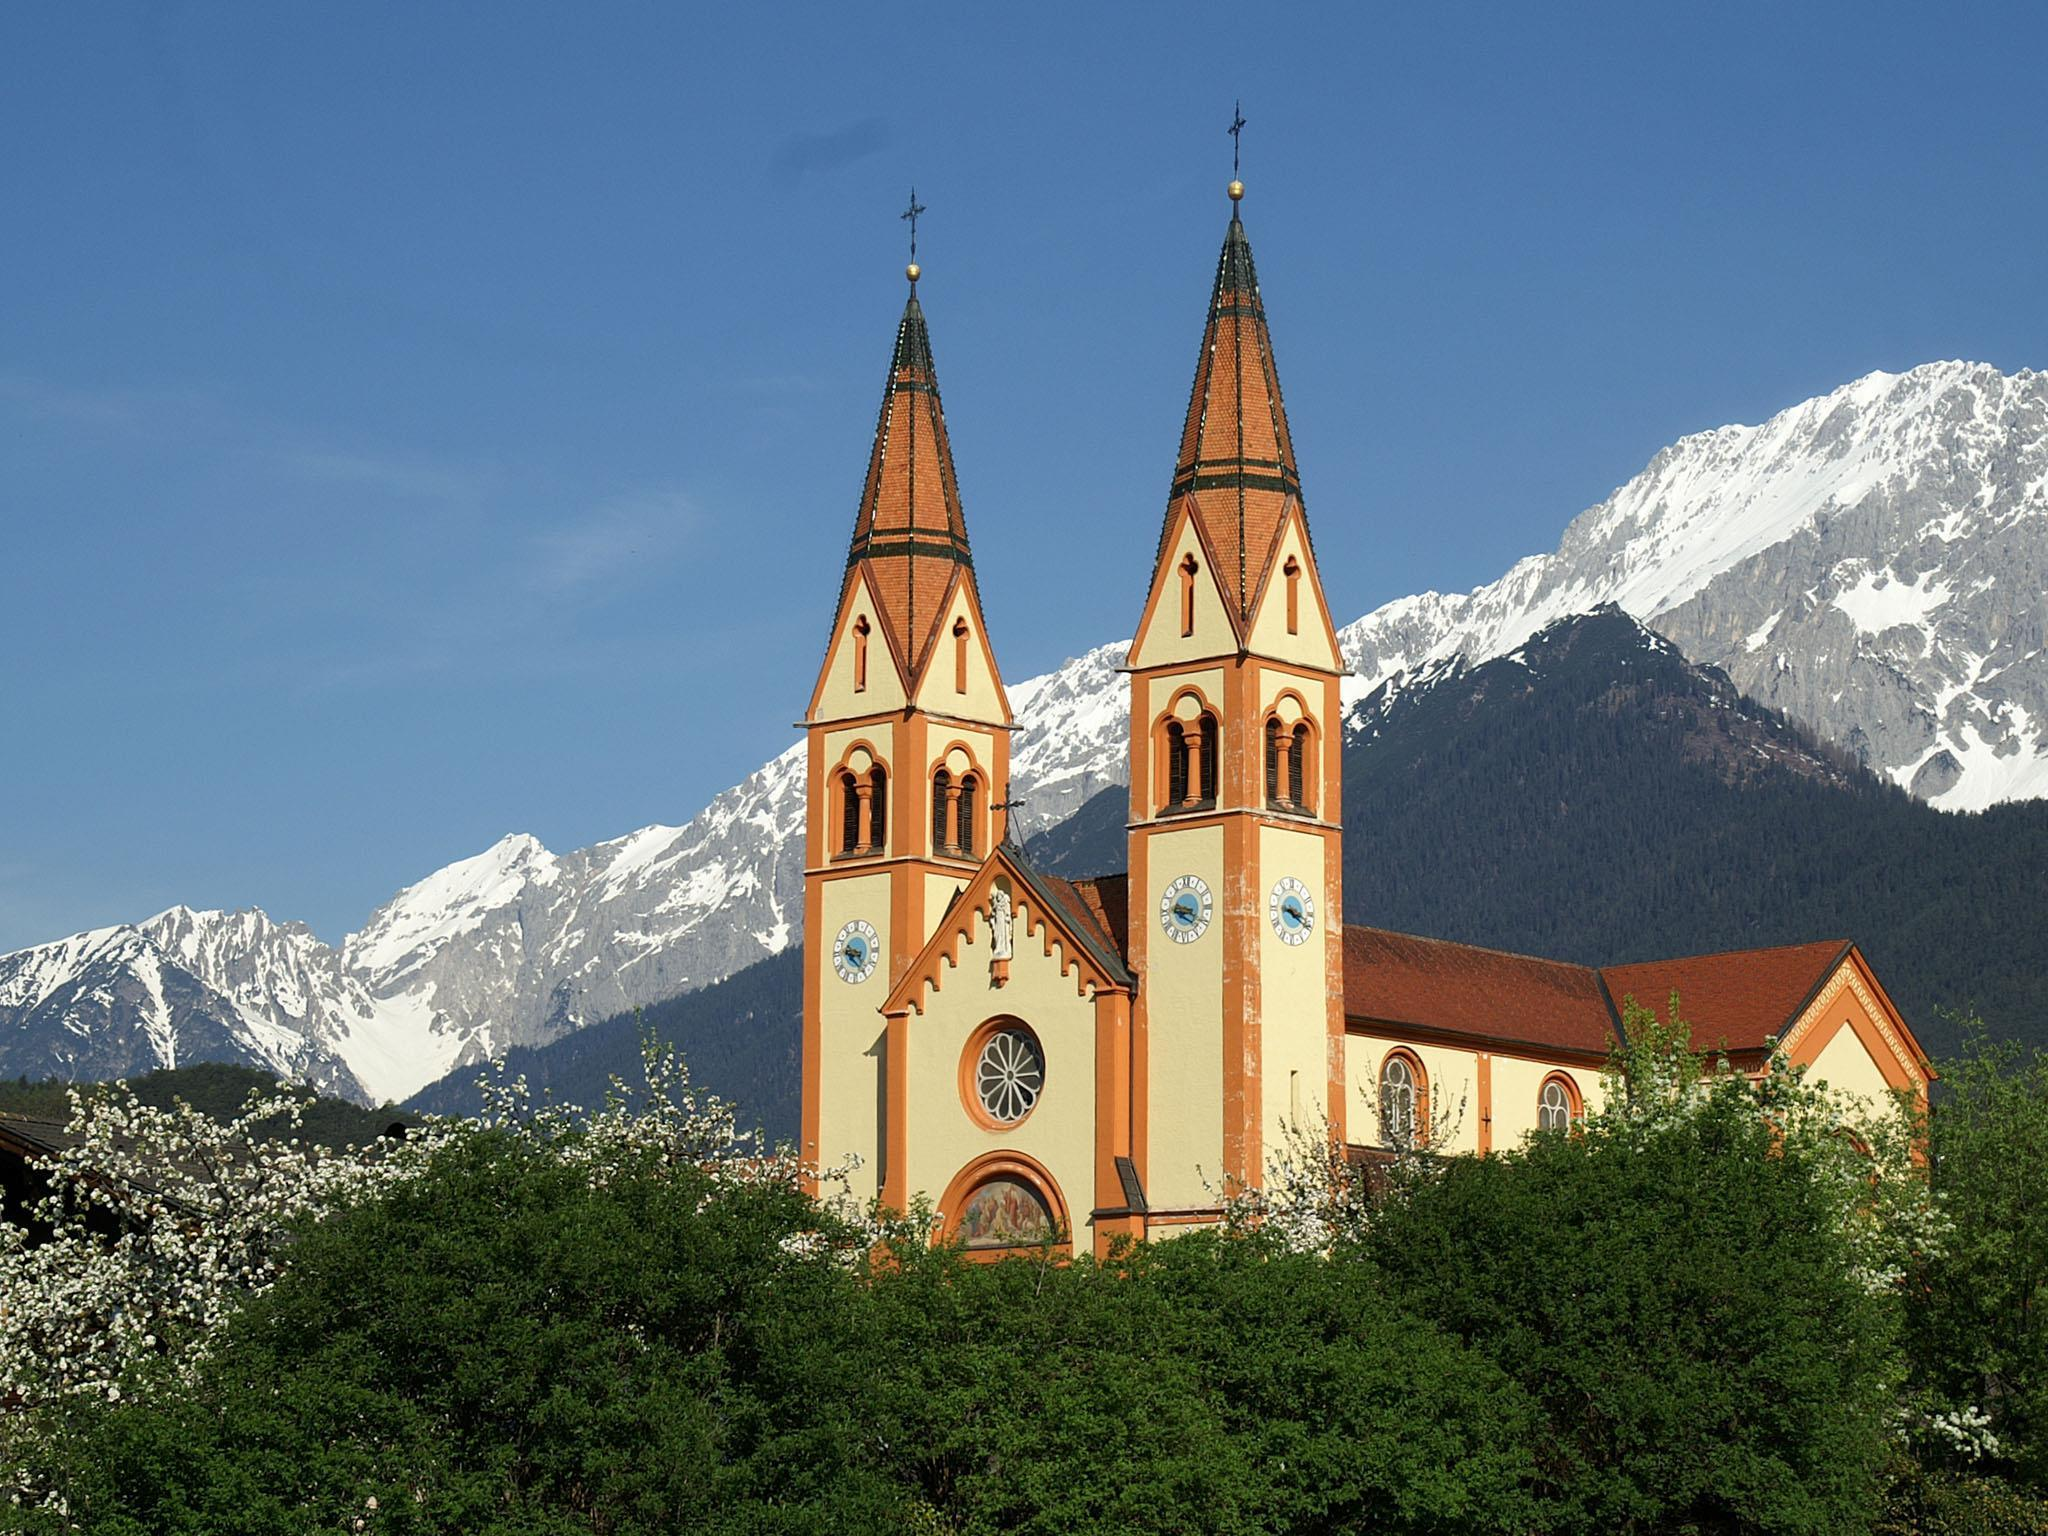 Pfarrkirche Hl. Peter & Paul